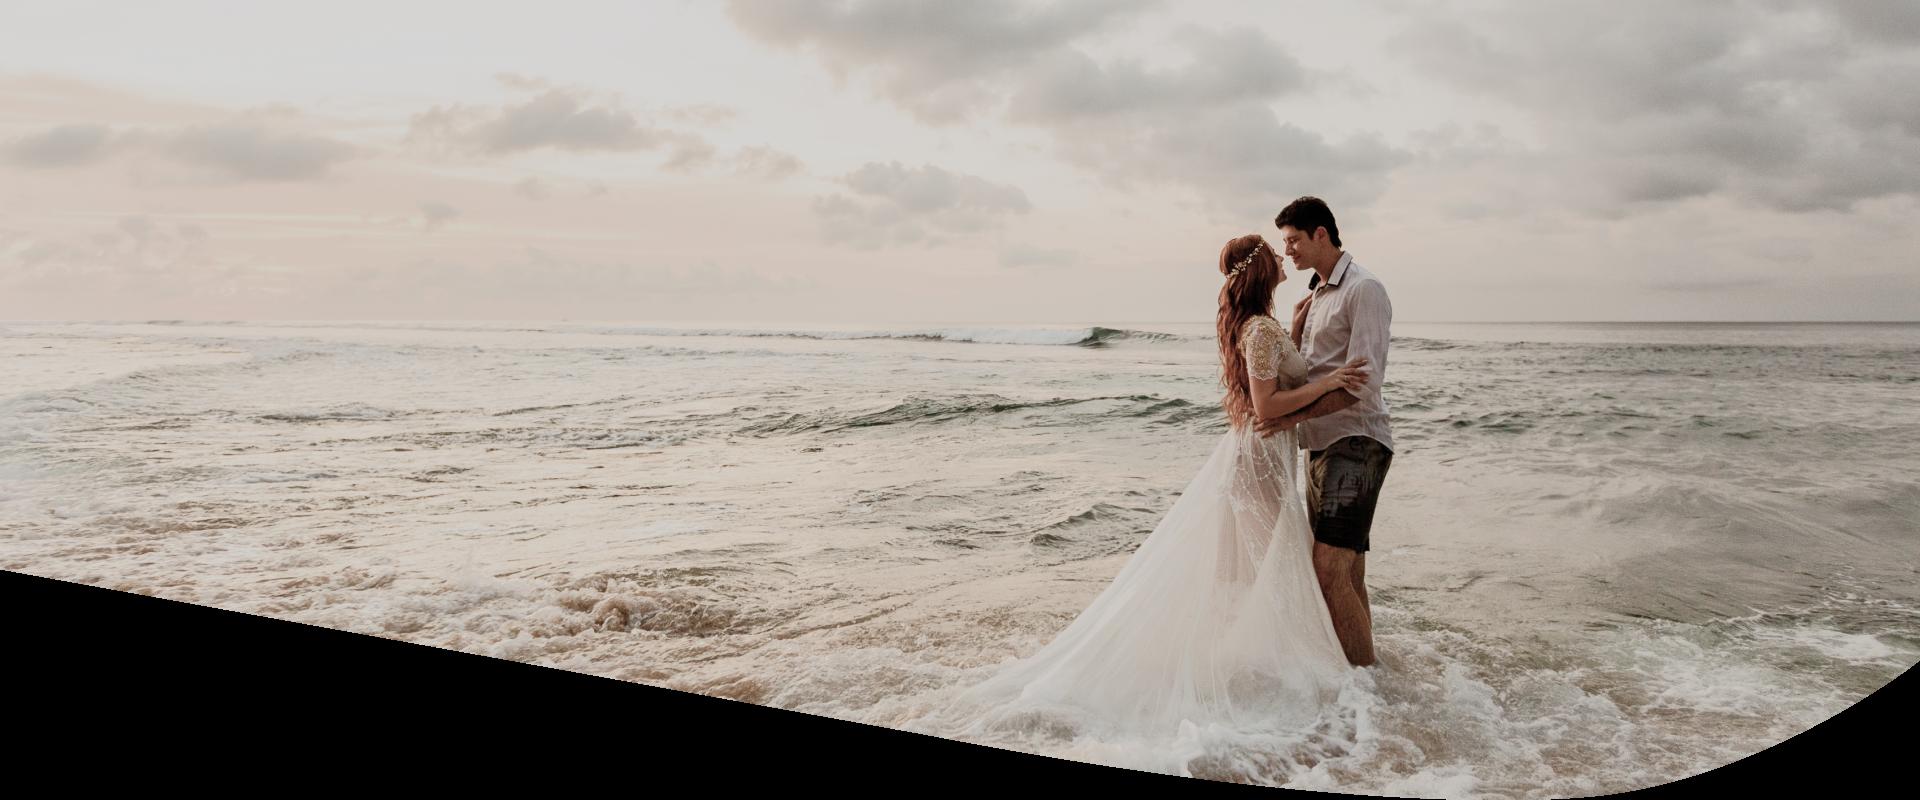 Singapore Wedding Hub